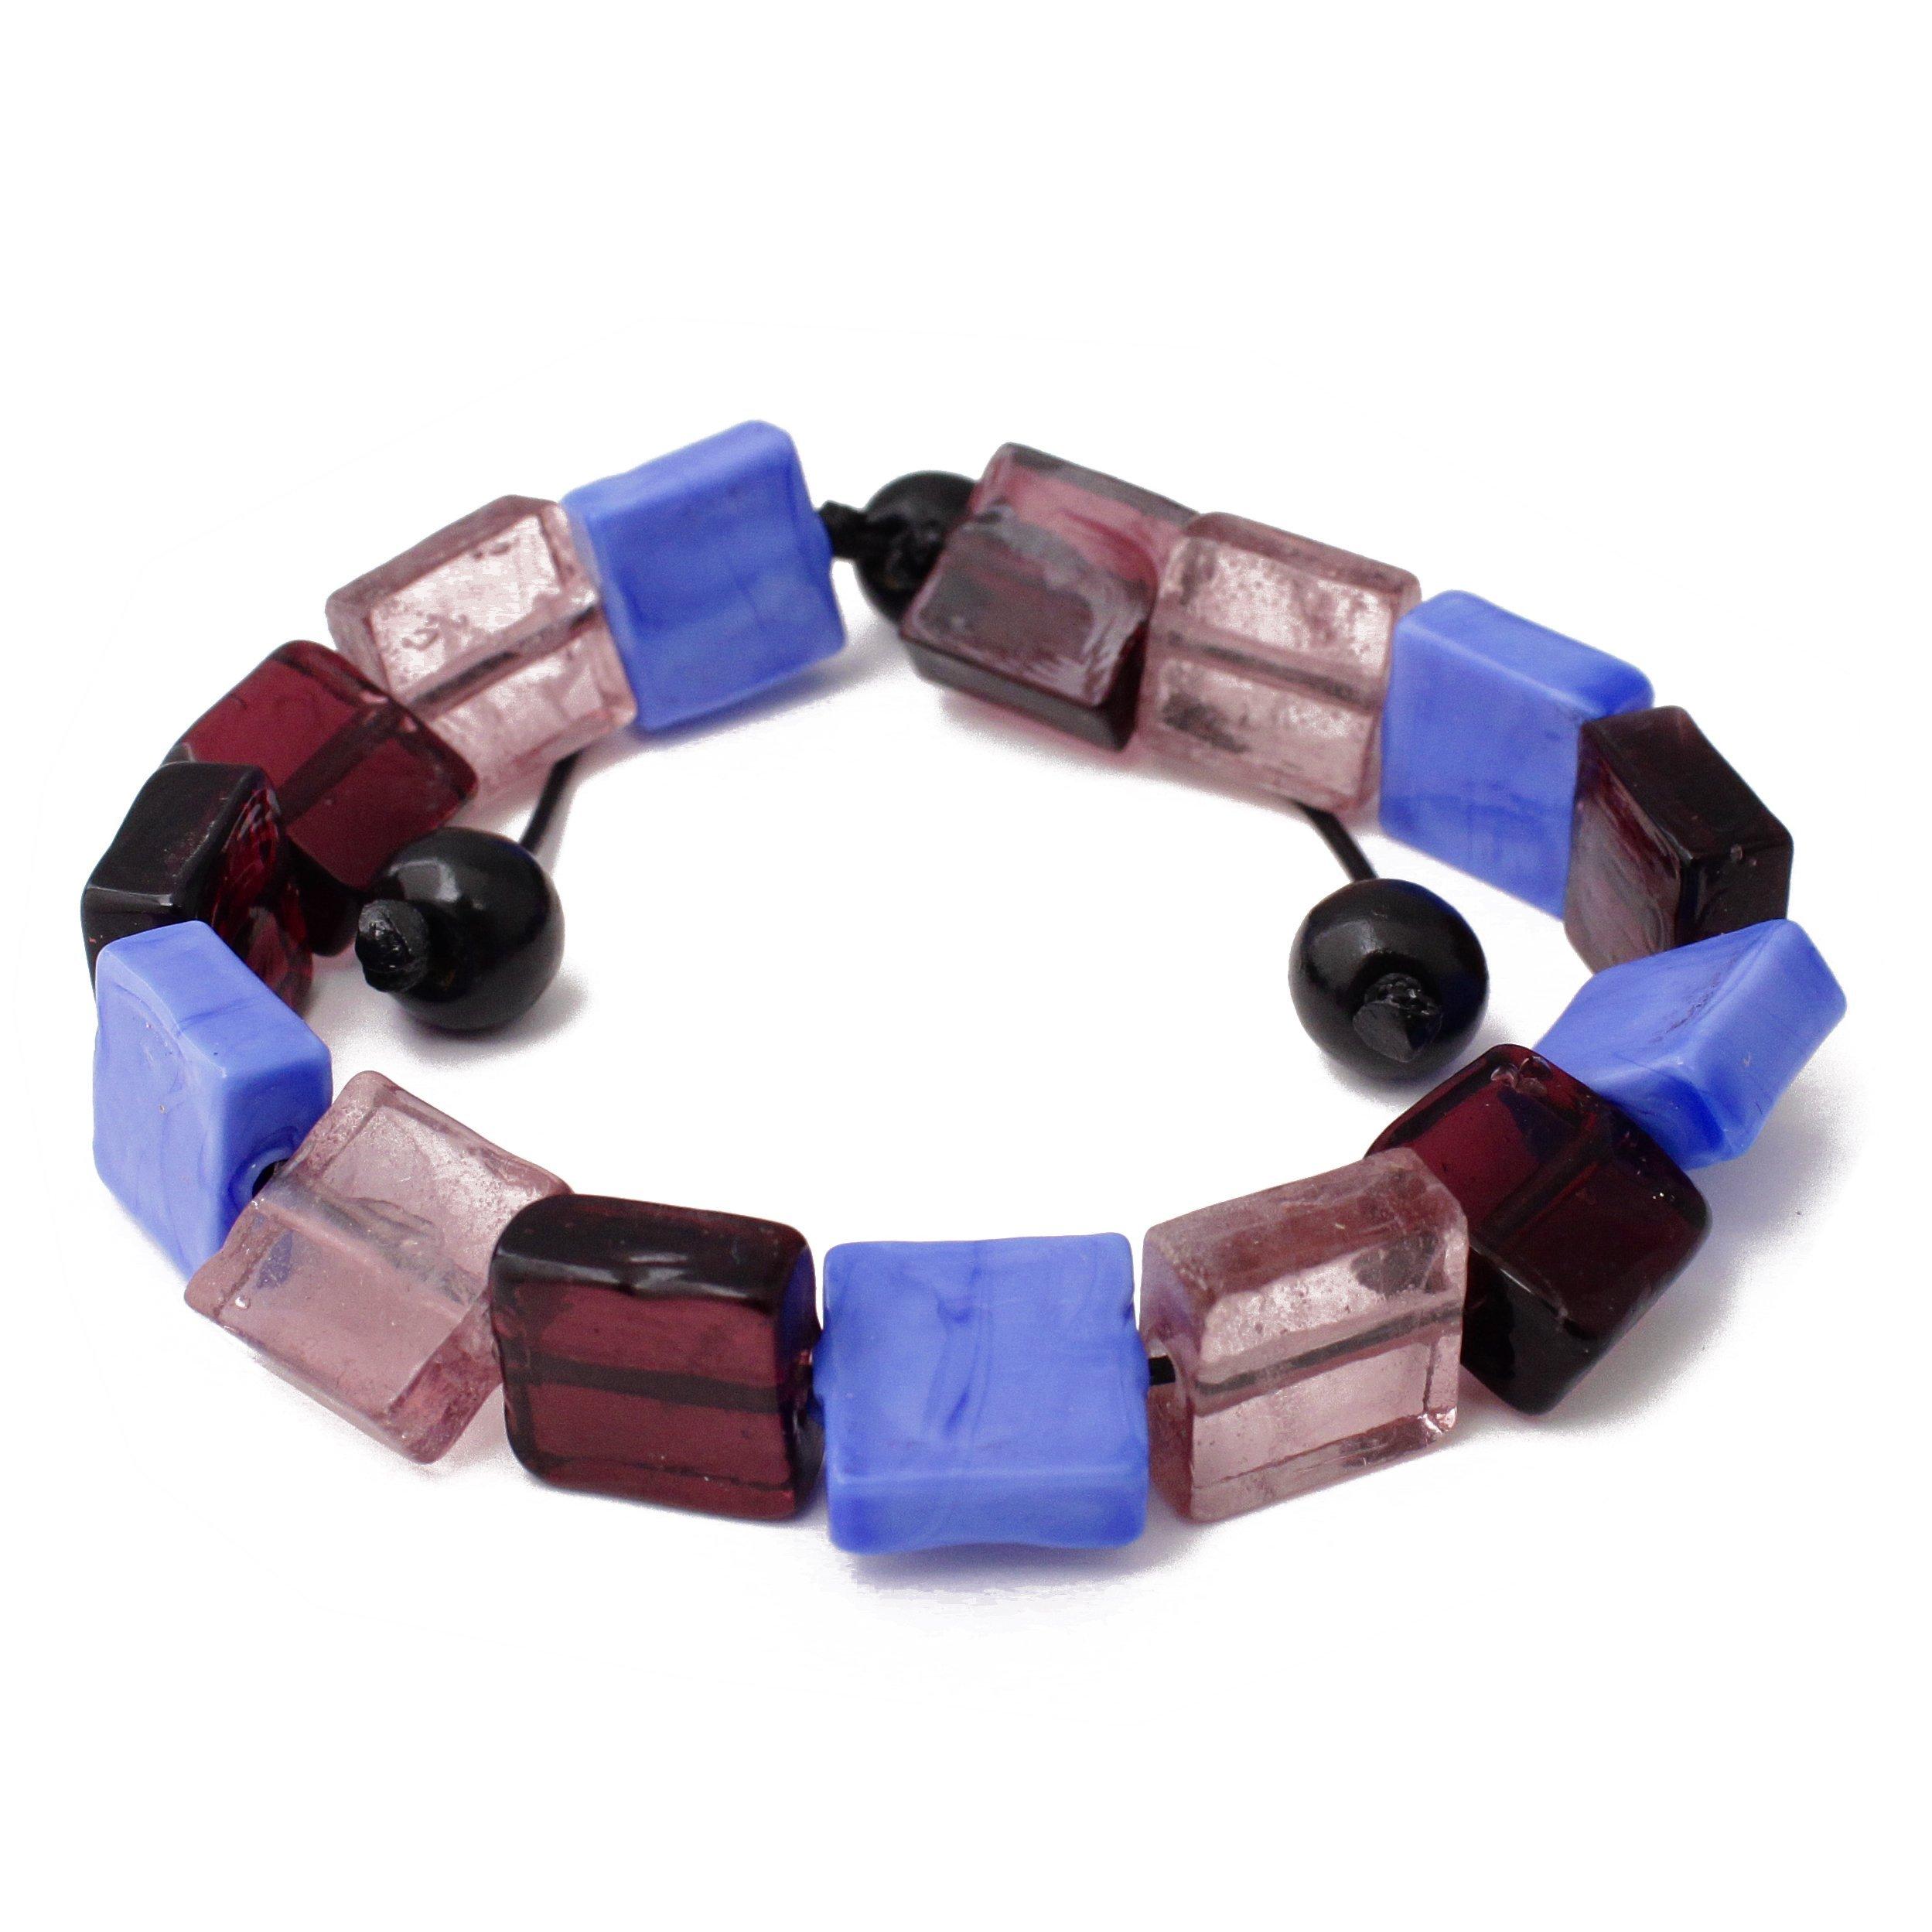 Perepaix RAVE Retro Burgandy Glass Beads Black Wax Cord Mens Bracelet